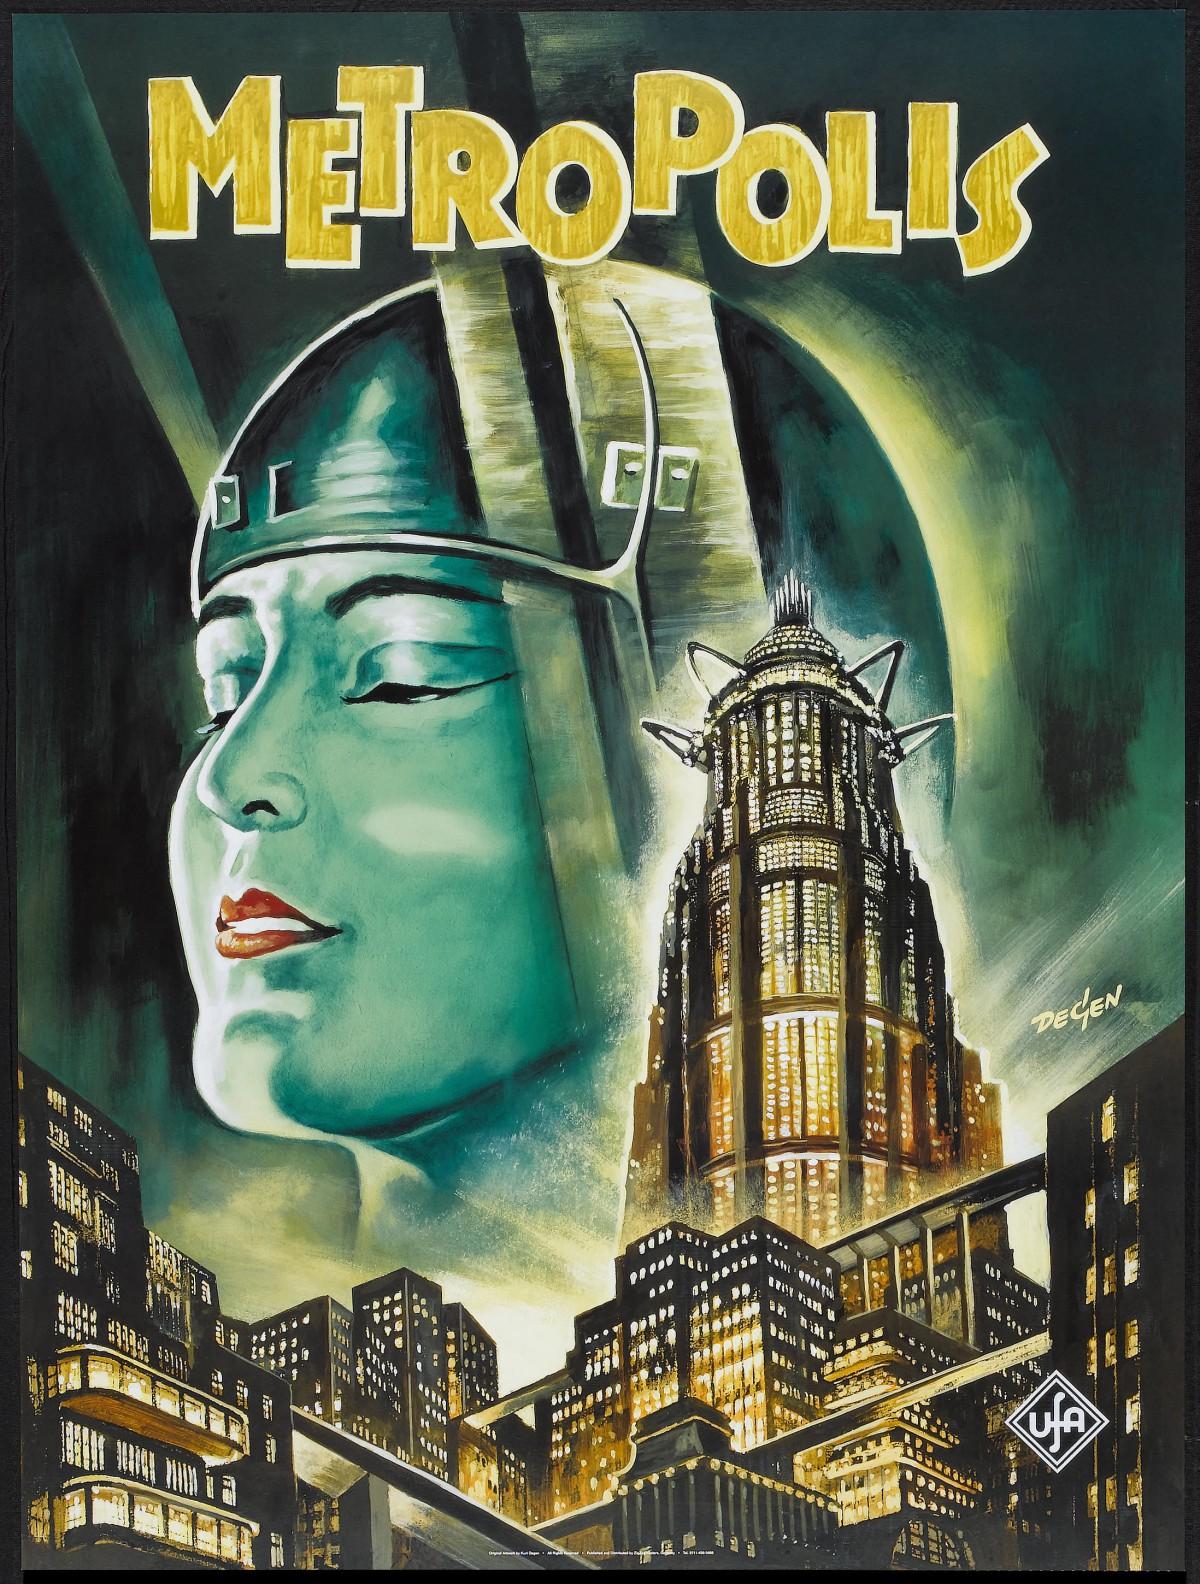 51. Metropolis (1927)